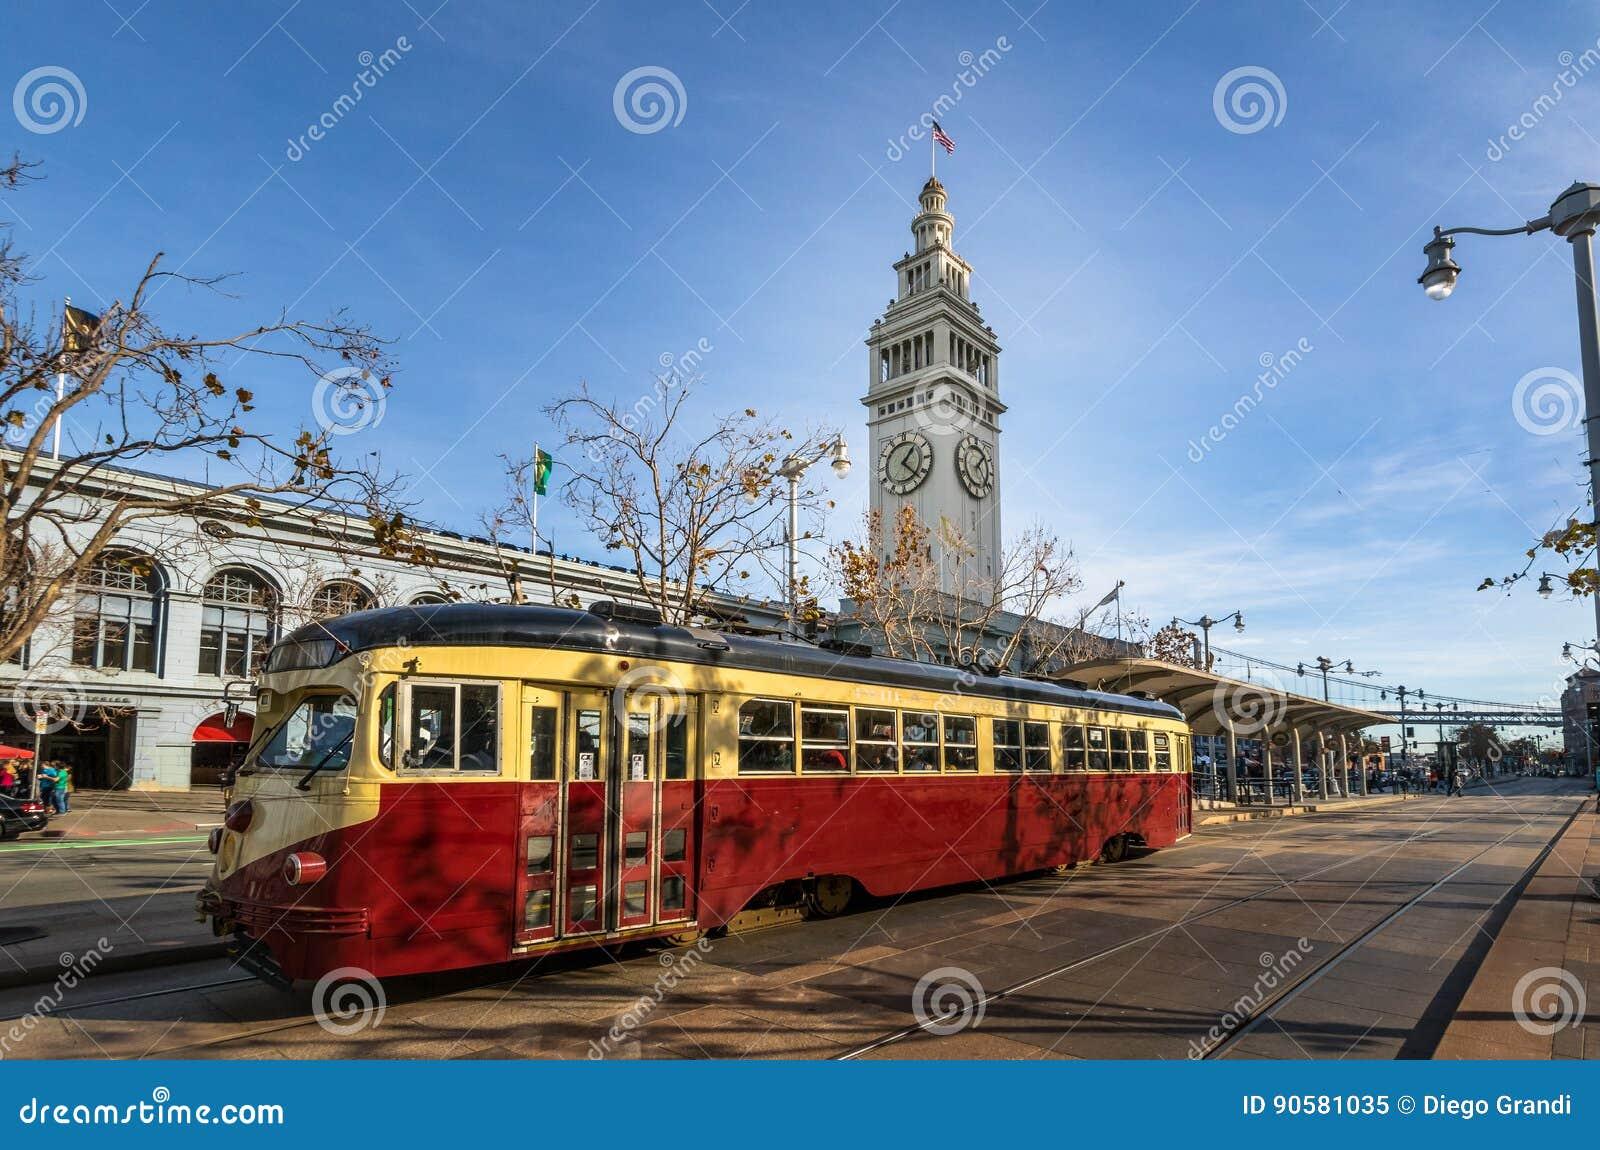 Straatauto of trollley of munitram voor San Francisco Ferry Building in Embarcadero - San Francisco, Californië, de V.S.